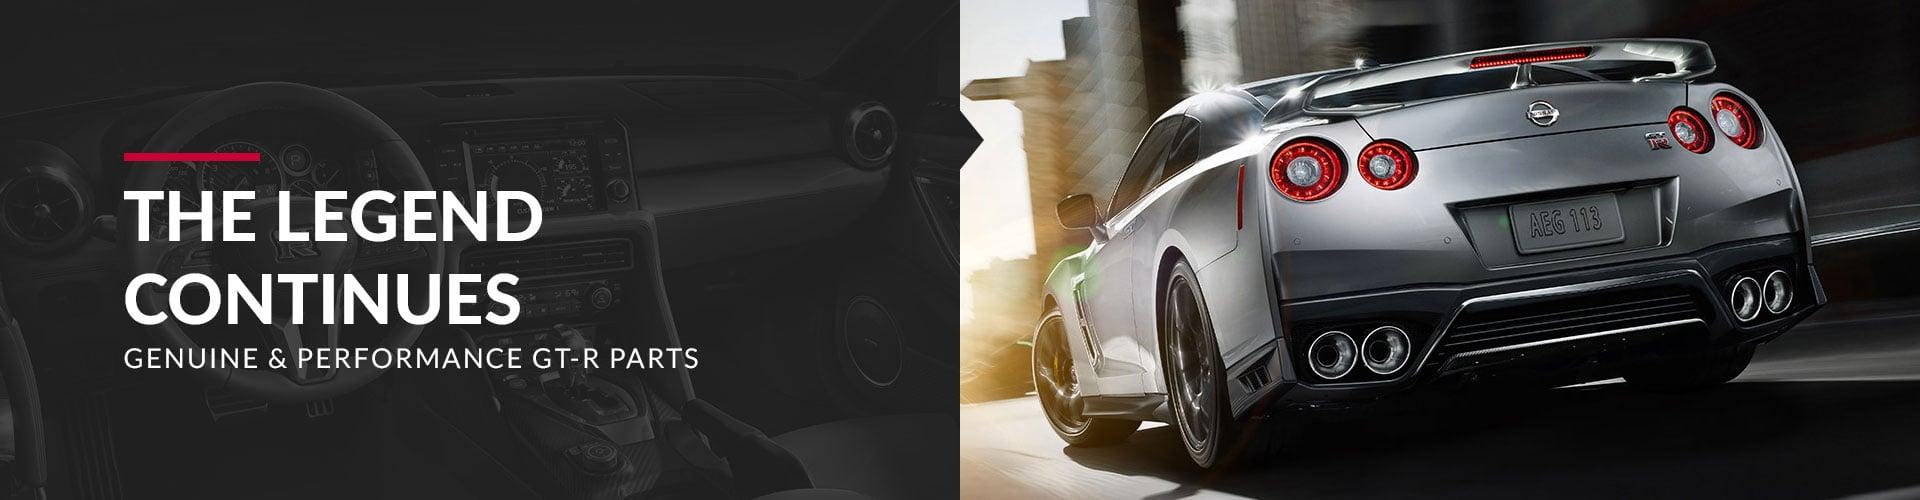 GT-R OEM & Performance Parts